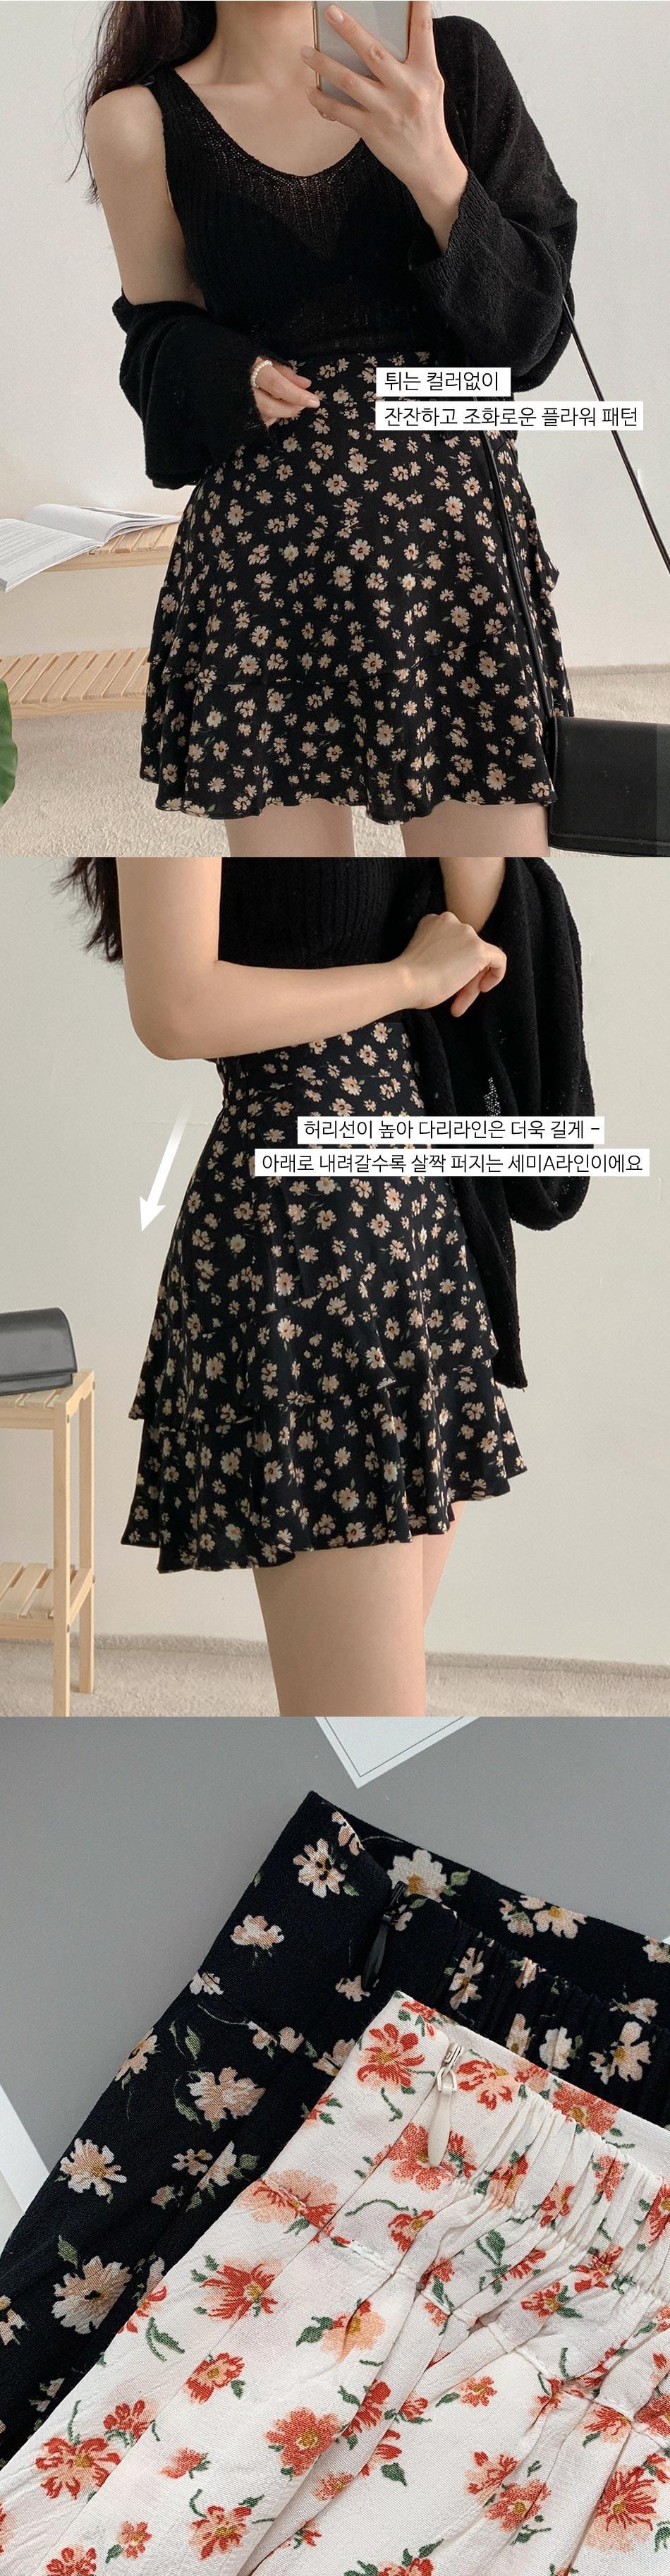 Shampoo Flow Banding Skirt